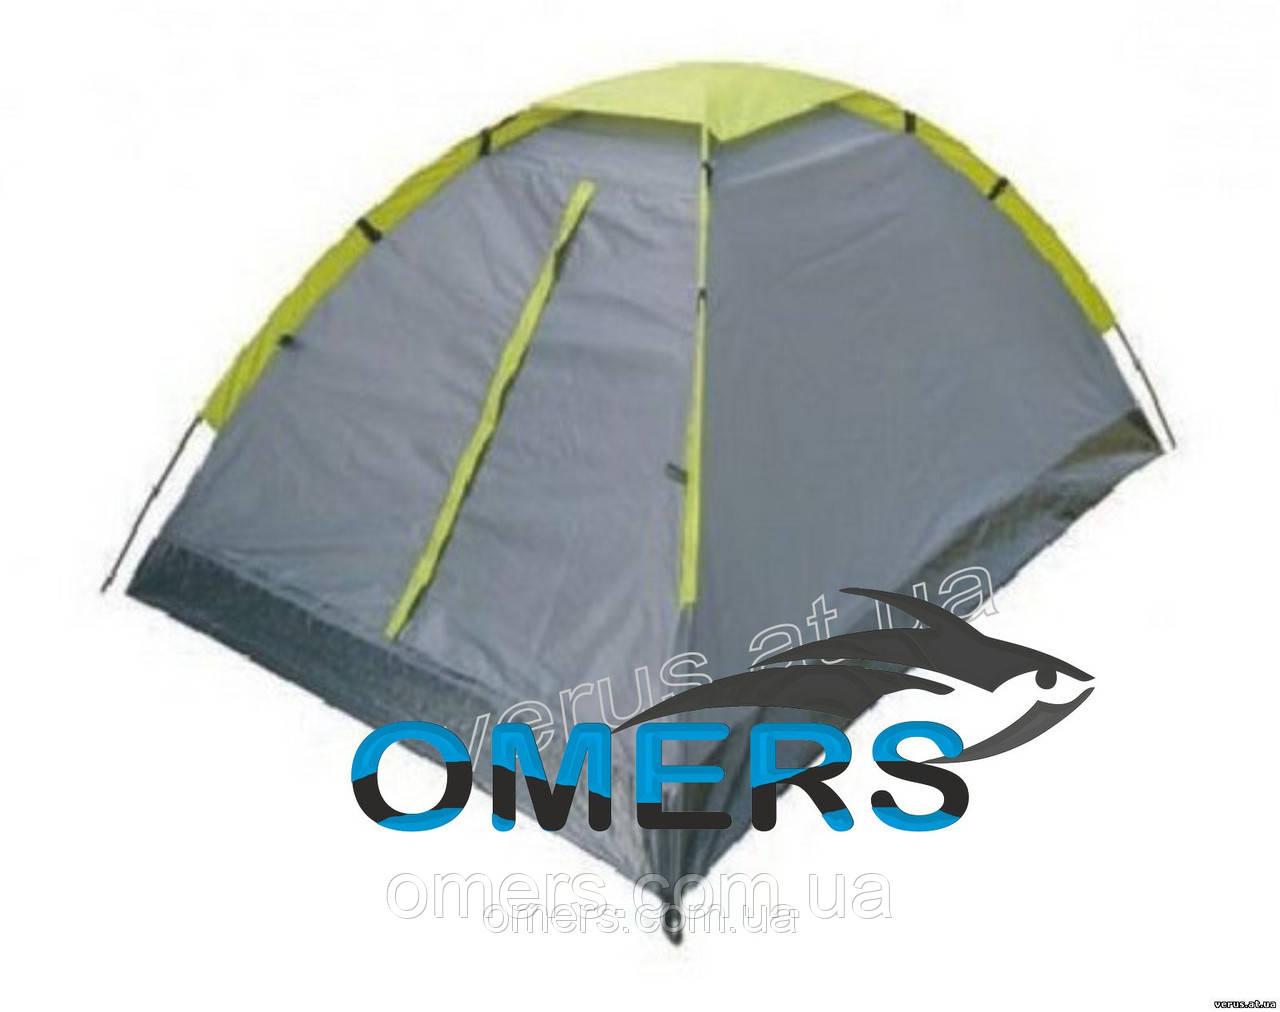 Палатка однослойная Паук Verus